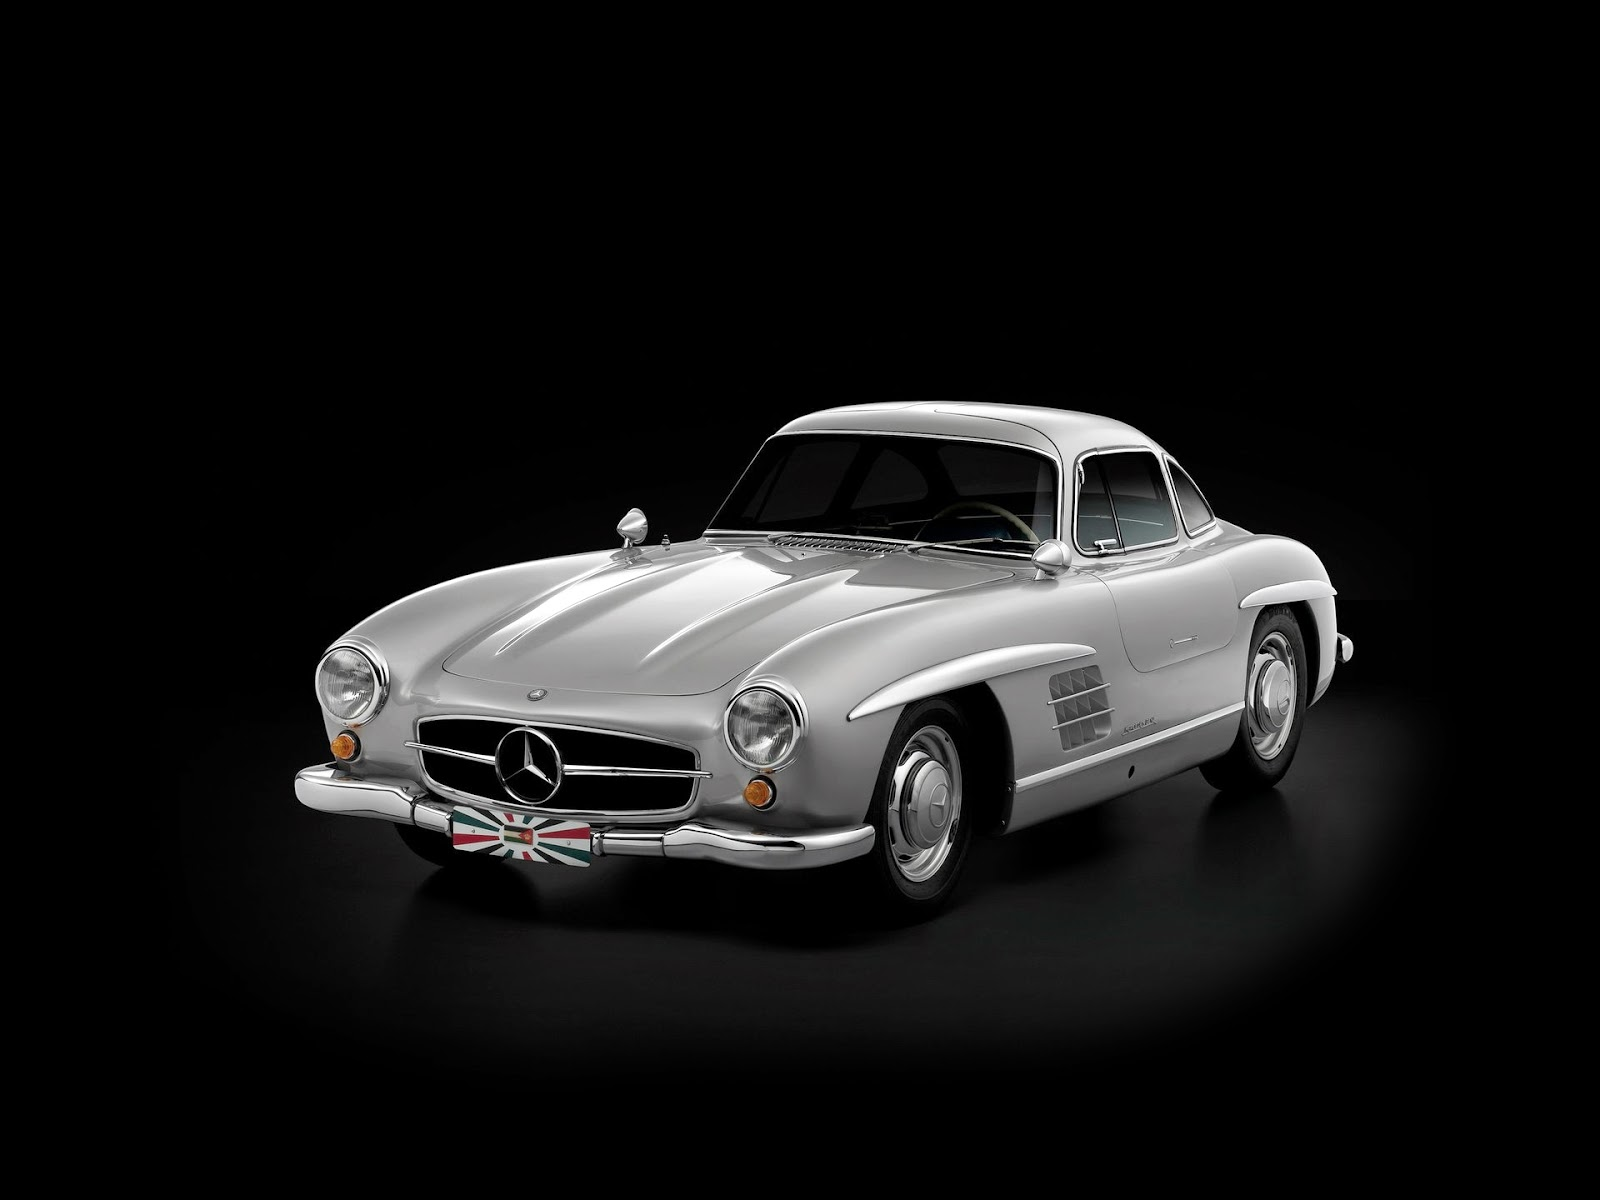 imagenes de autos modificados imagenes de autos mercedes benz